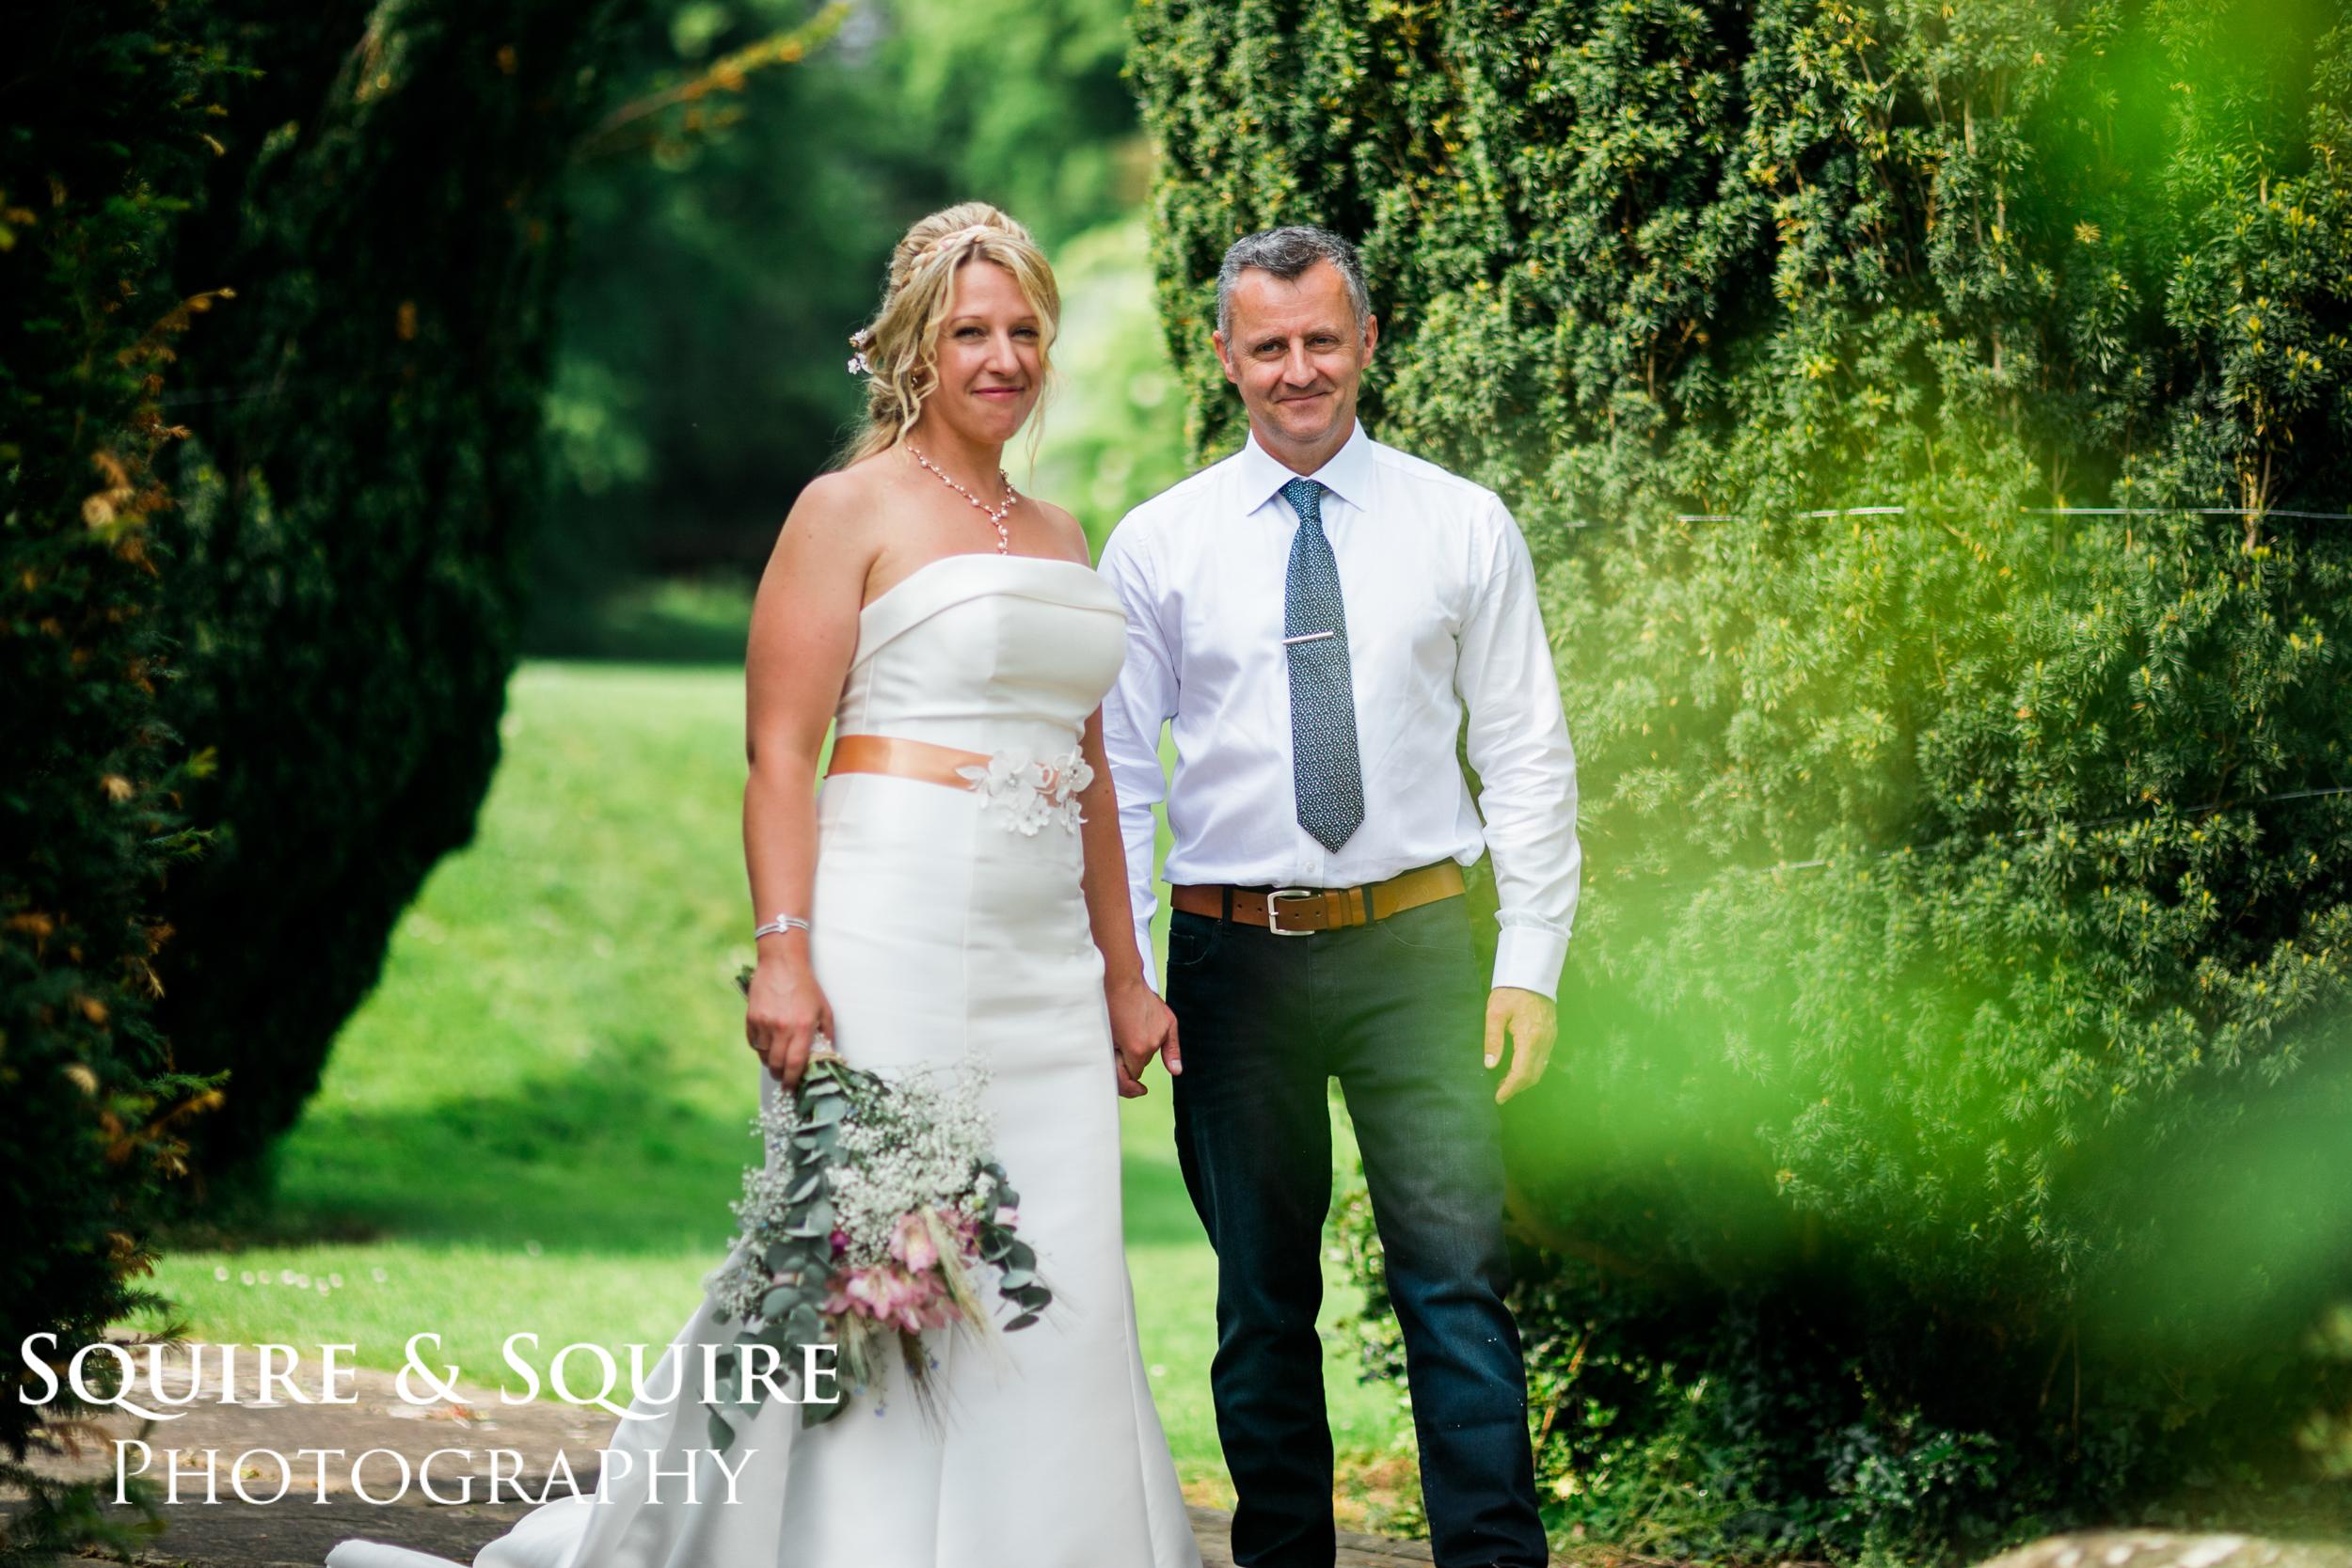 wedding_photography_catthorpe Manor (66 of 66).jpg